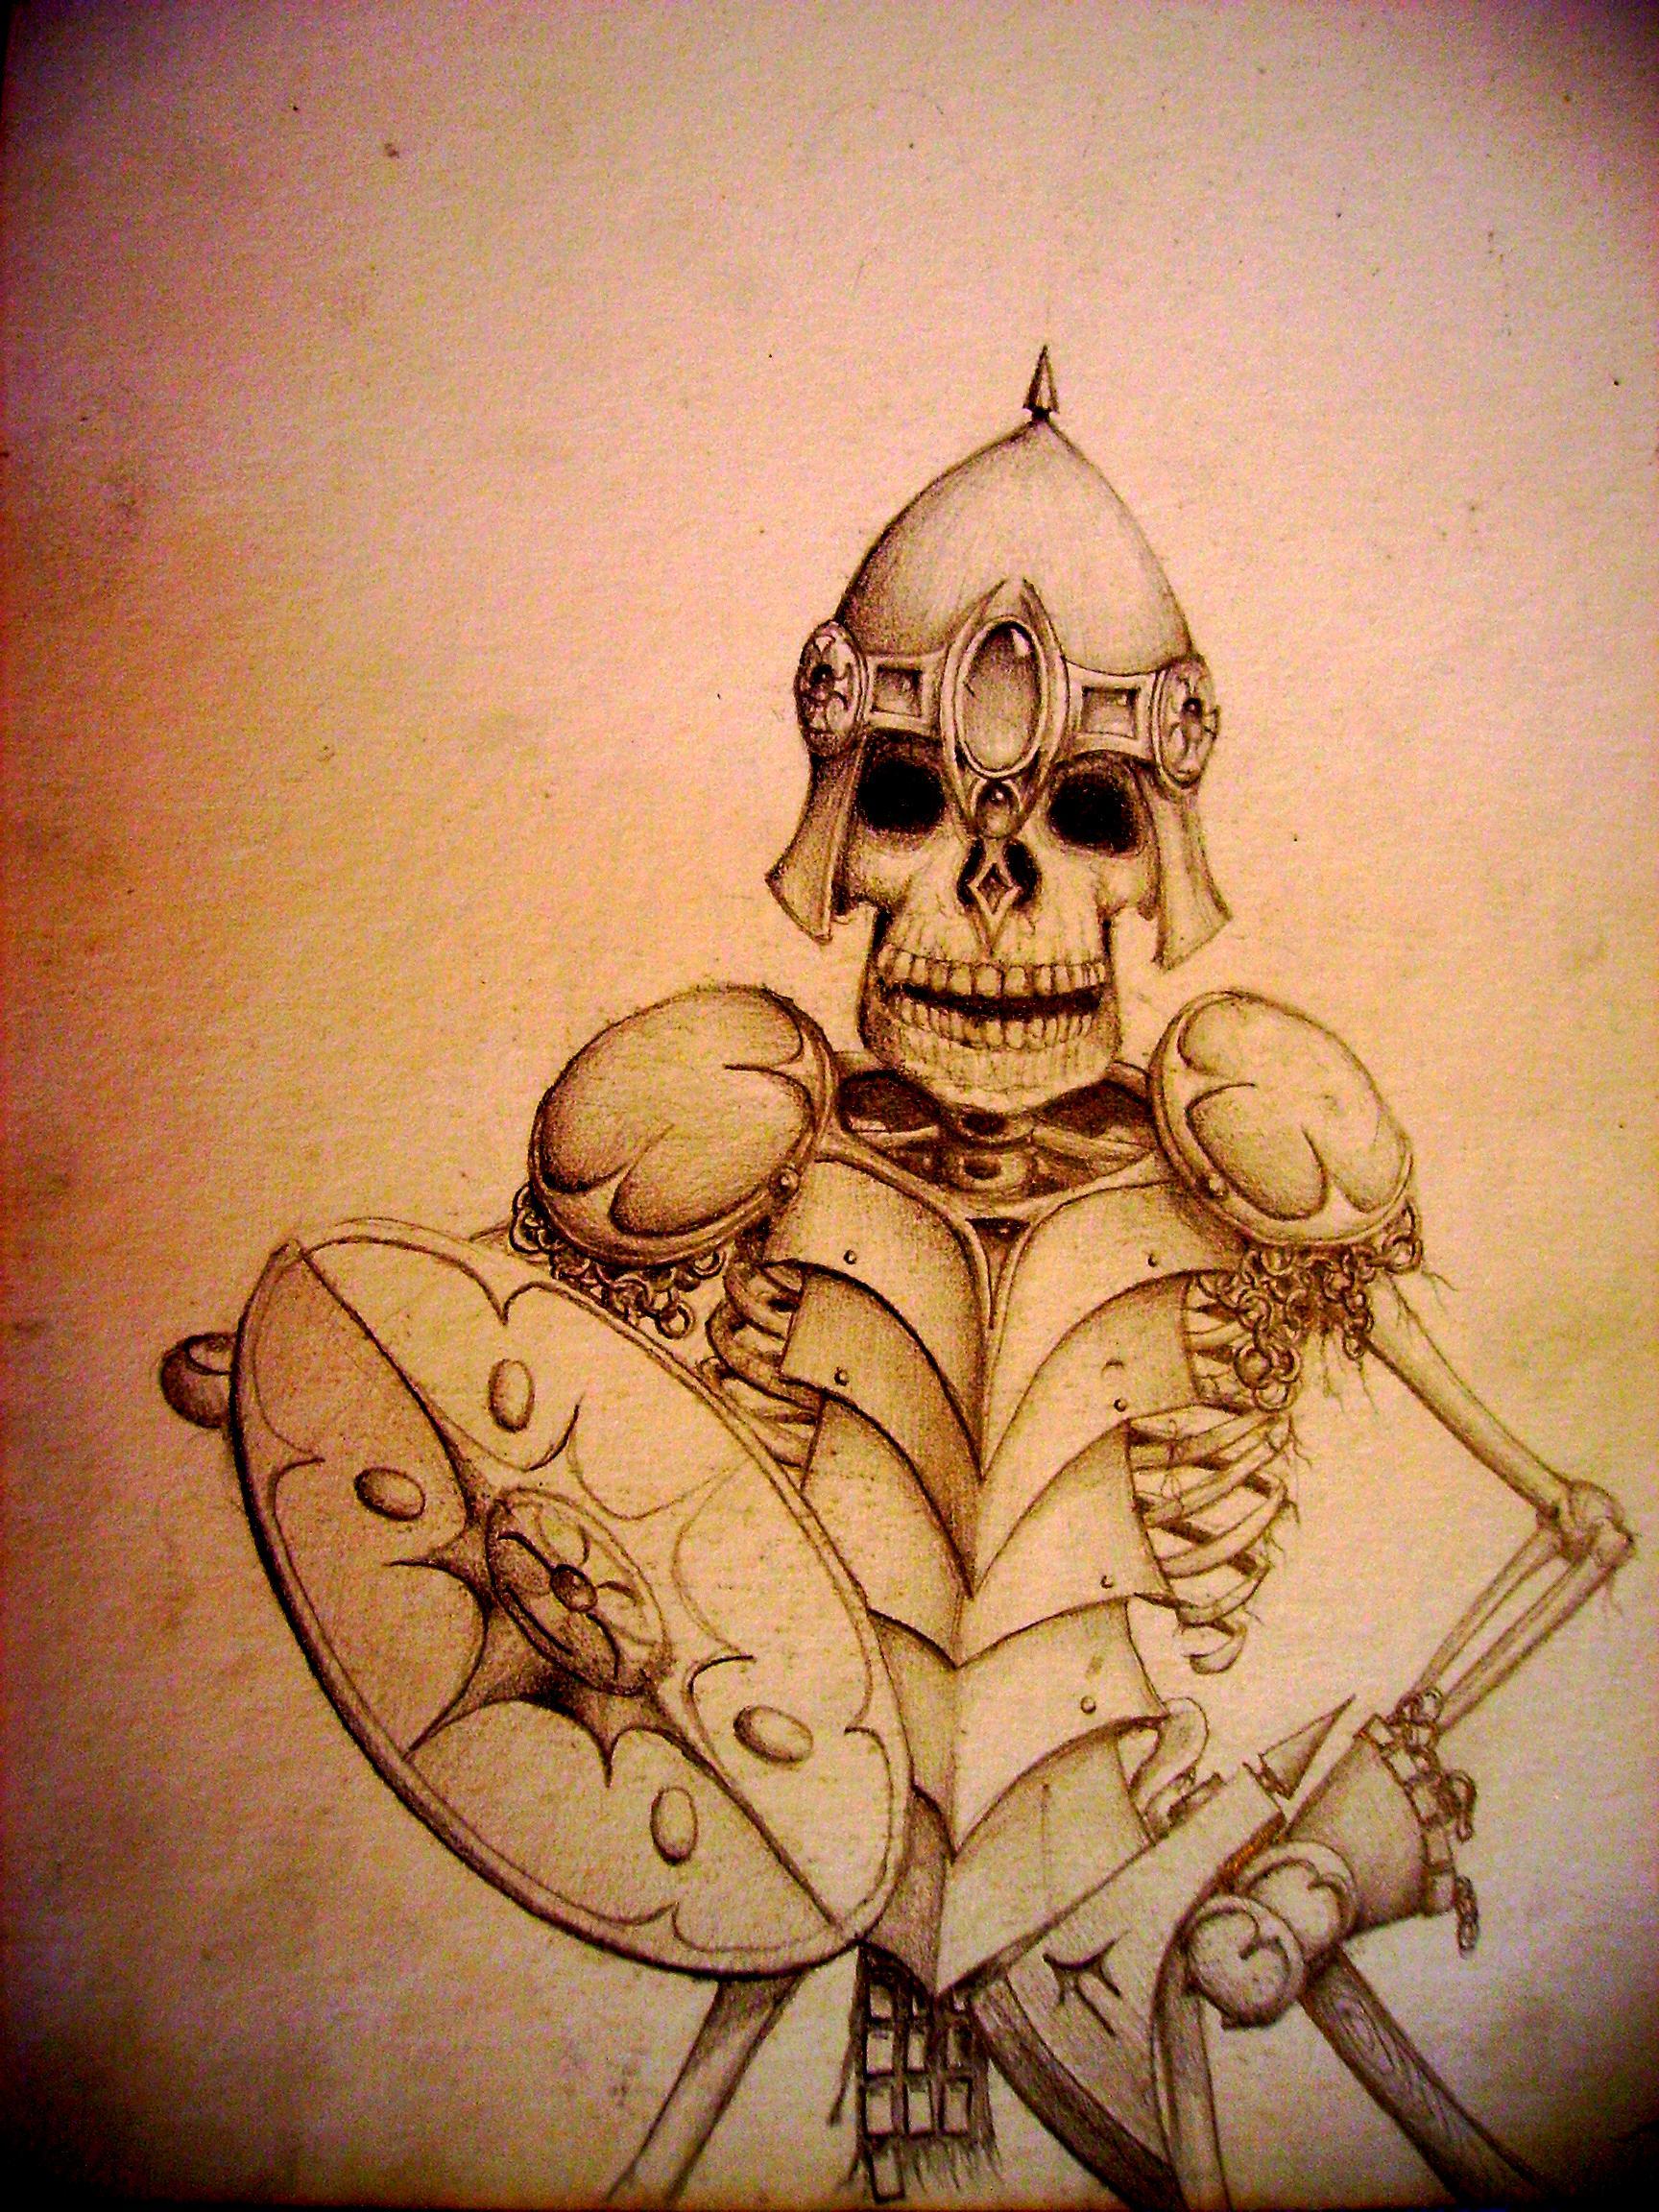 Artwork, Drawing, Sculpture, Skeletons